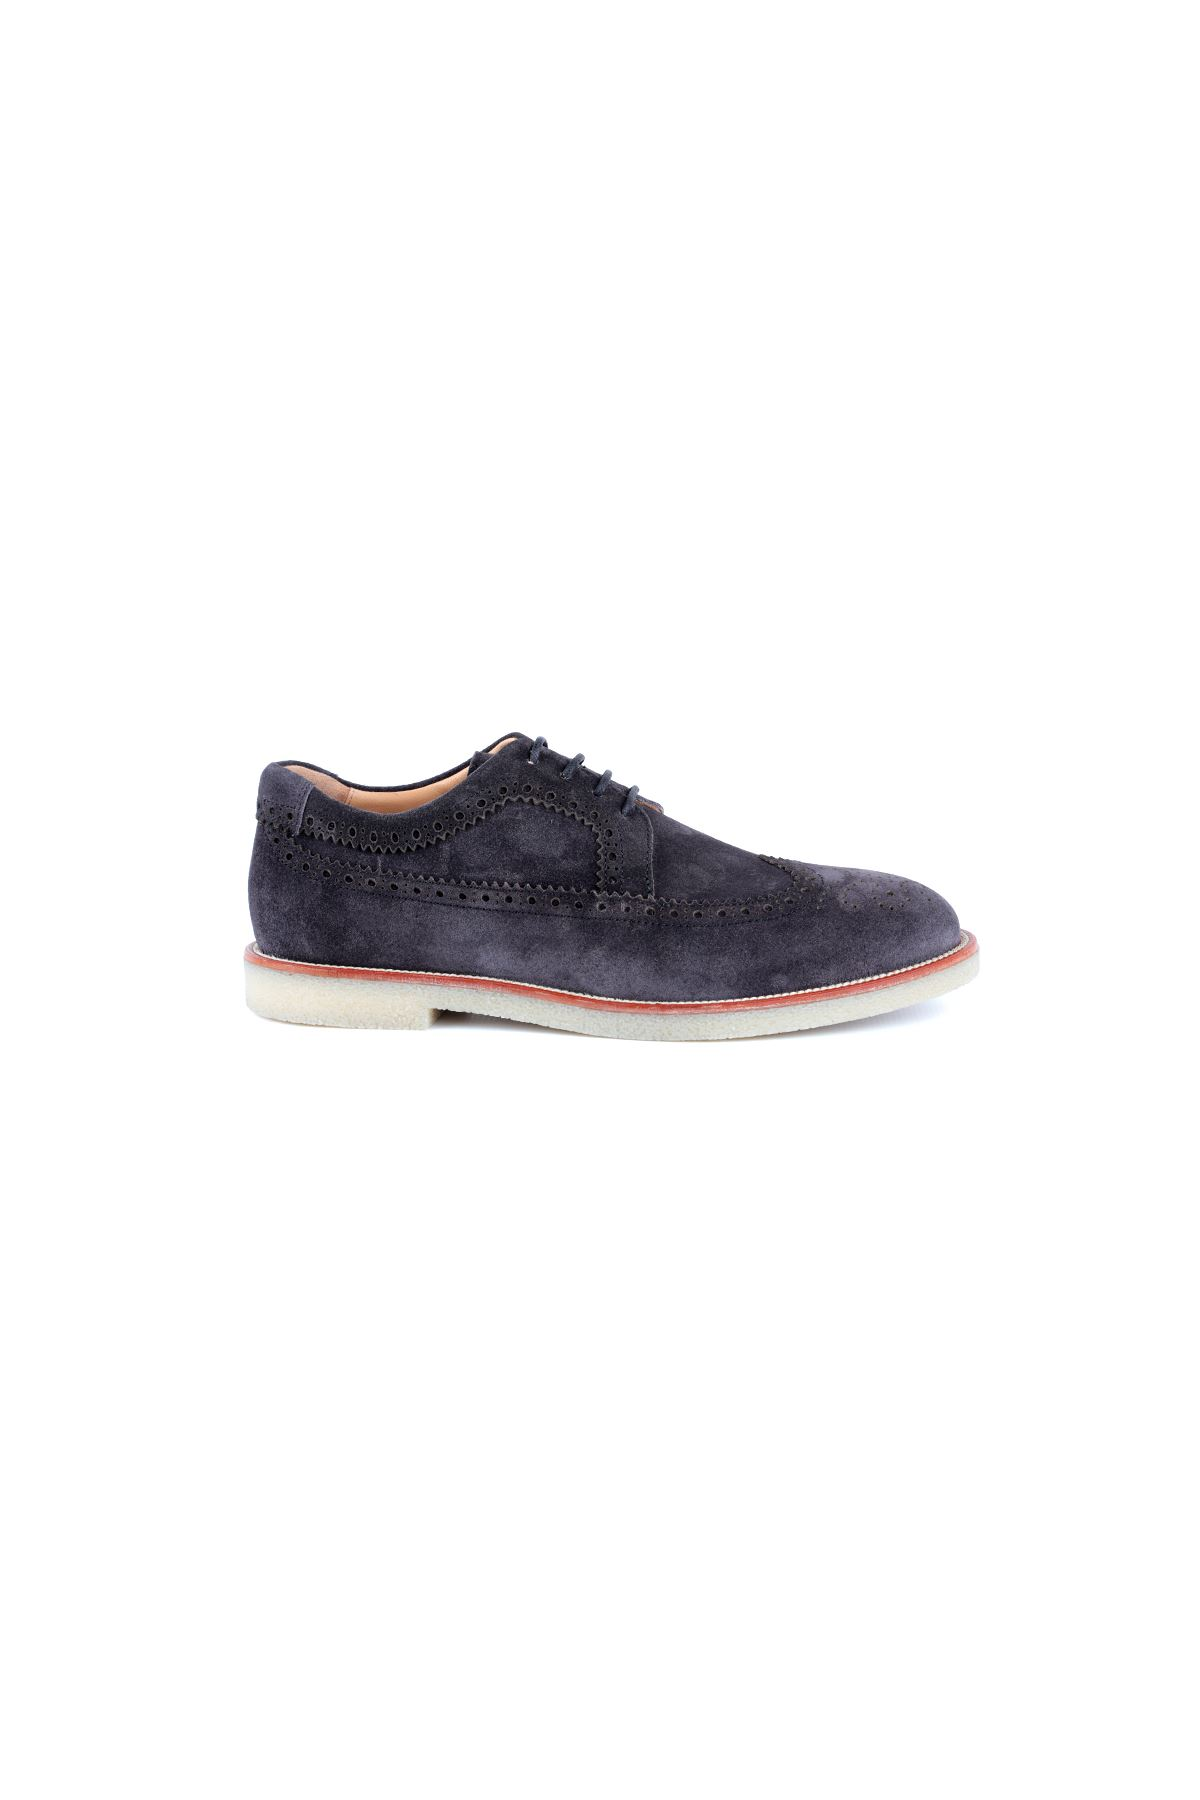 Libero L3743 Anthracite Casual Men Shoes